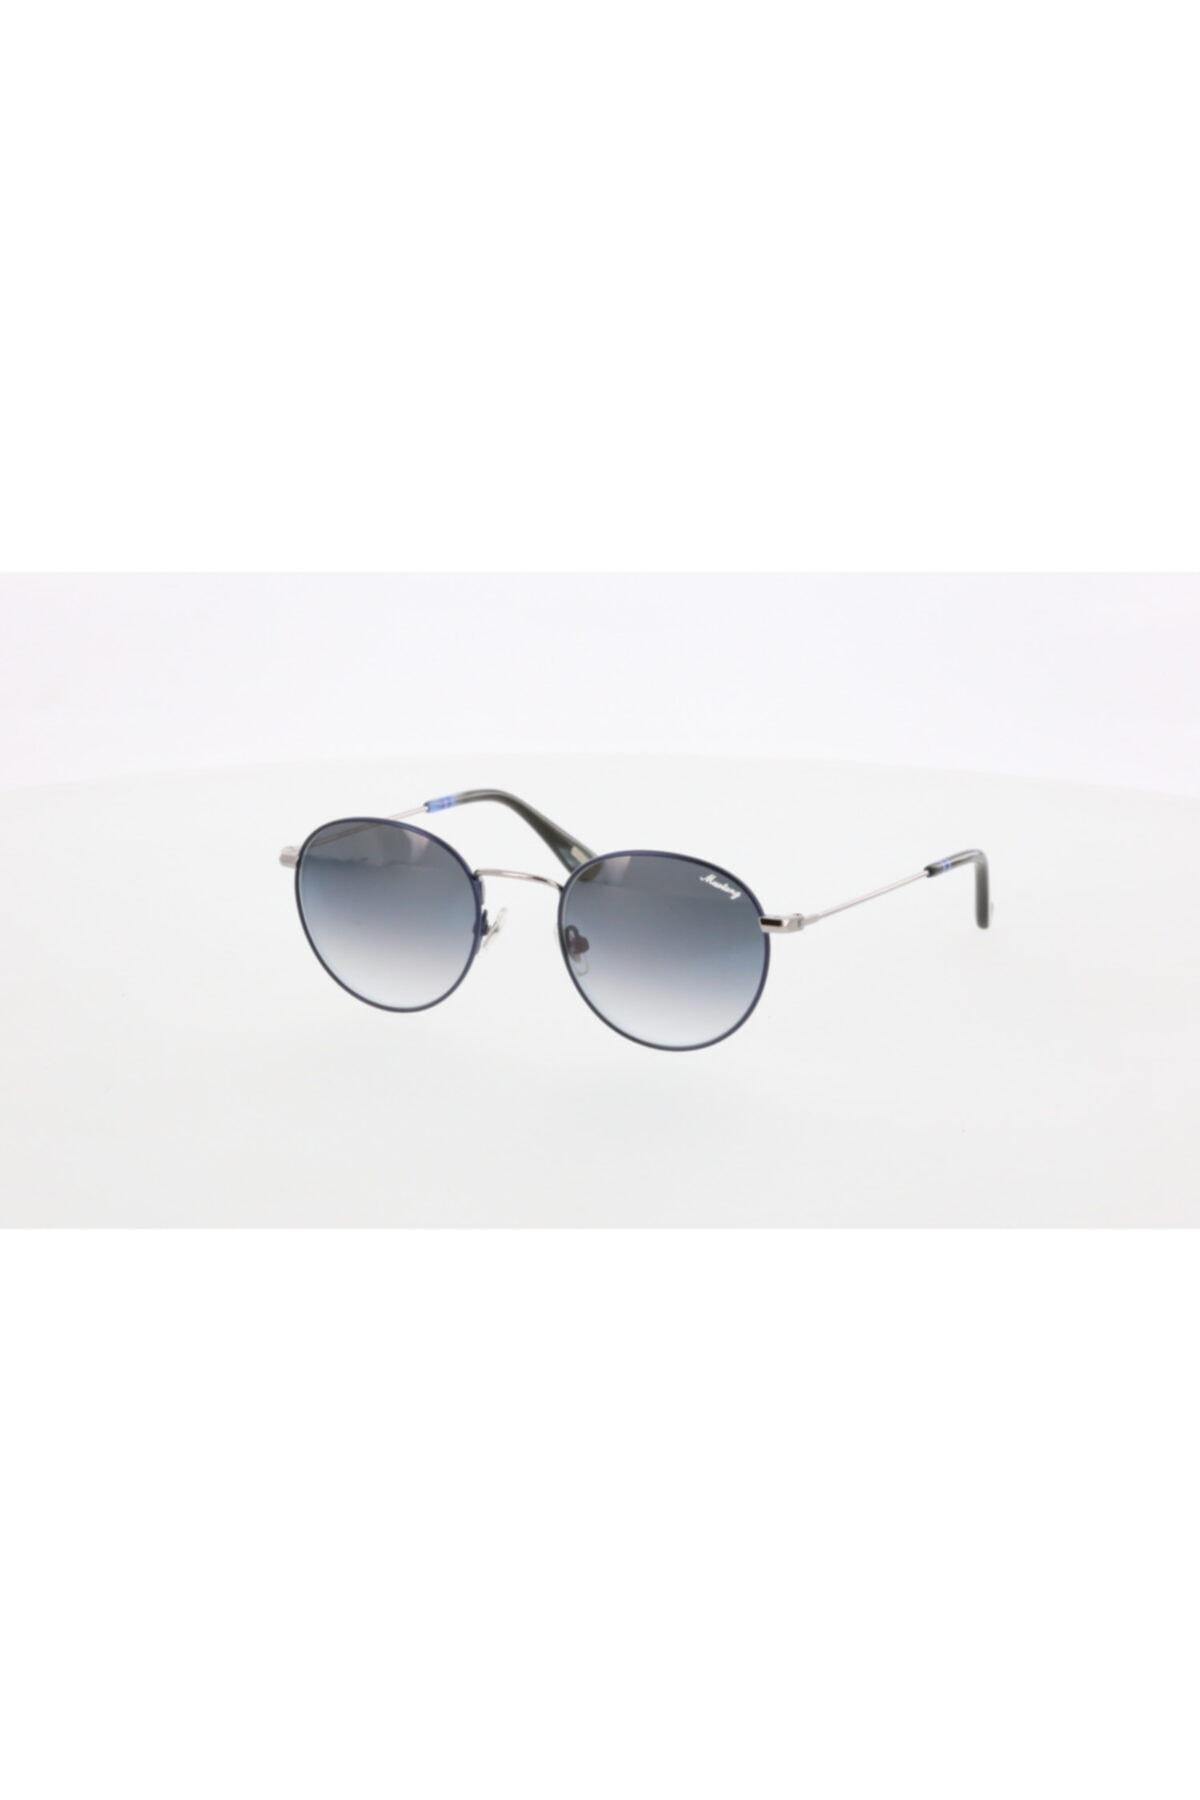 خرید عینک دودی خفن برند موستانگ رنگ متالیک کد ty97493877